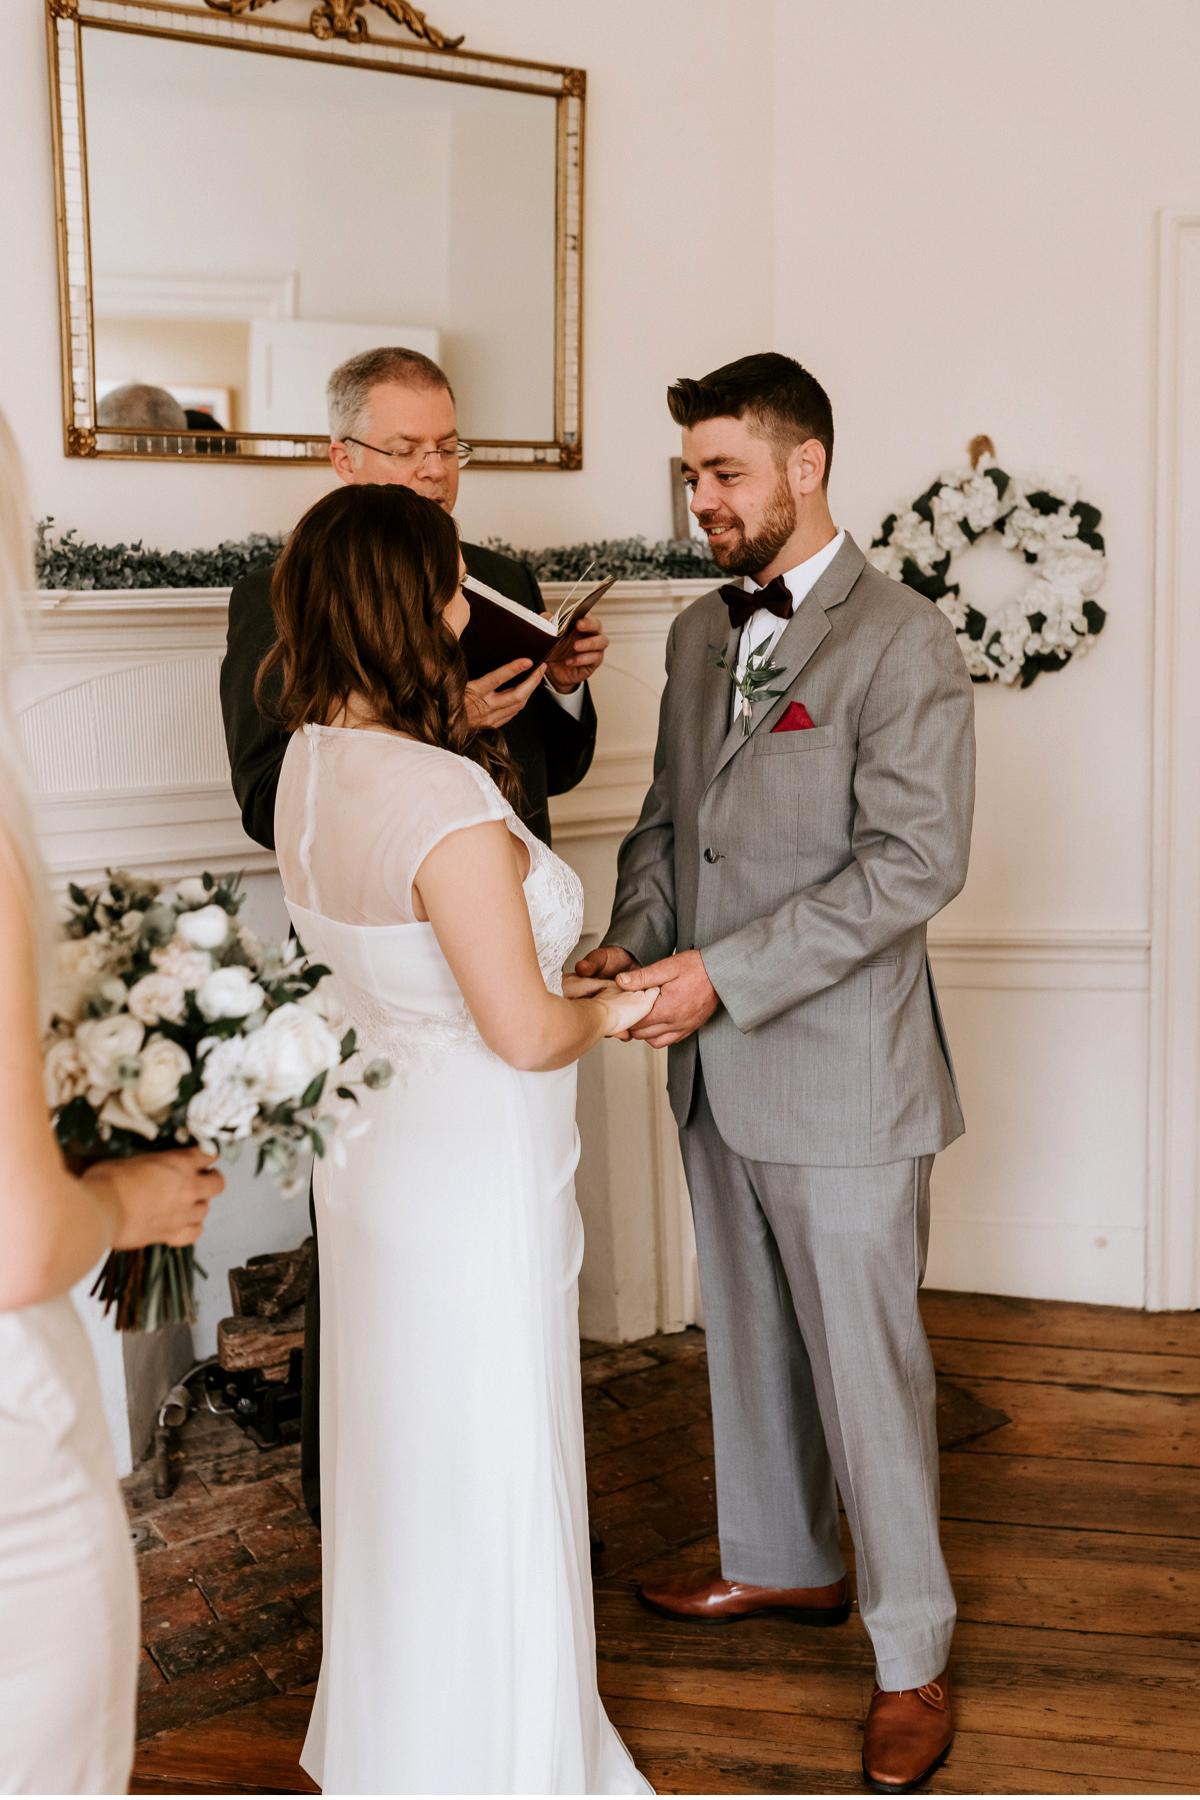 27 The Inn At Glencairn Destination Wedding Photographer Winter Elopement New Jersey Wedding Photographer Intimate Wedding